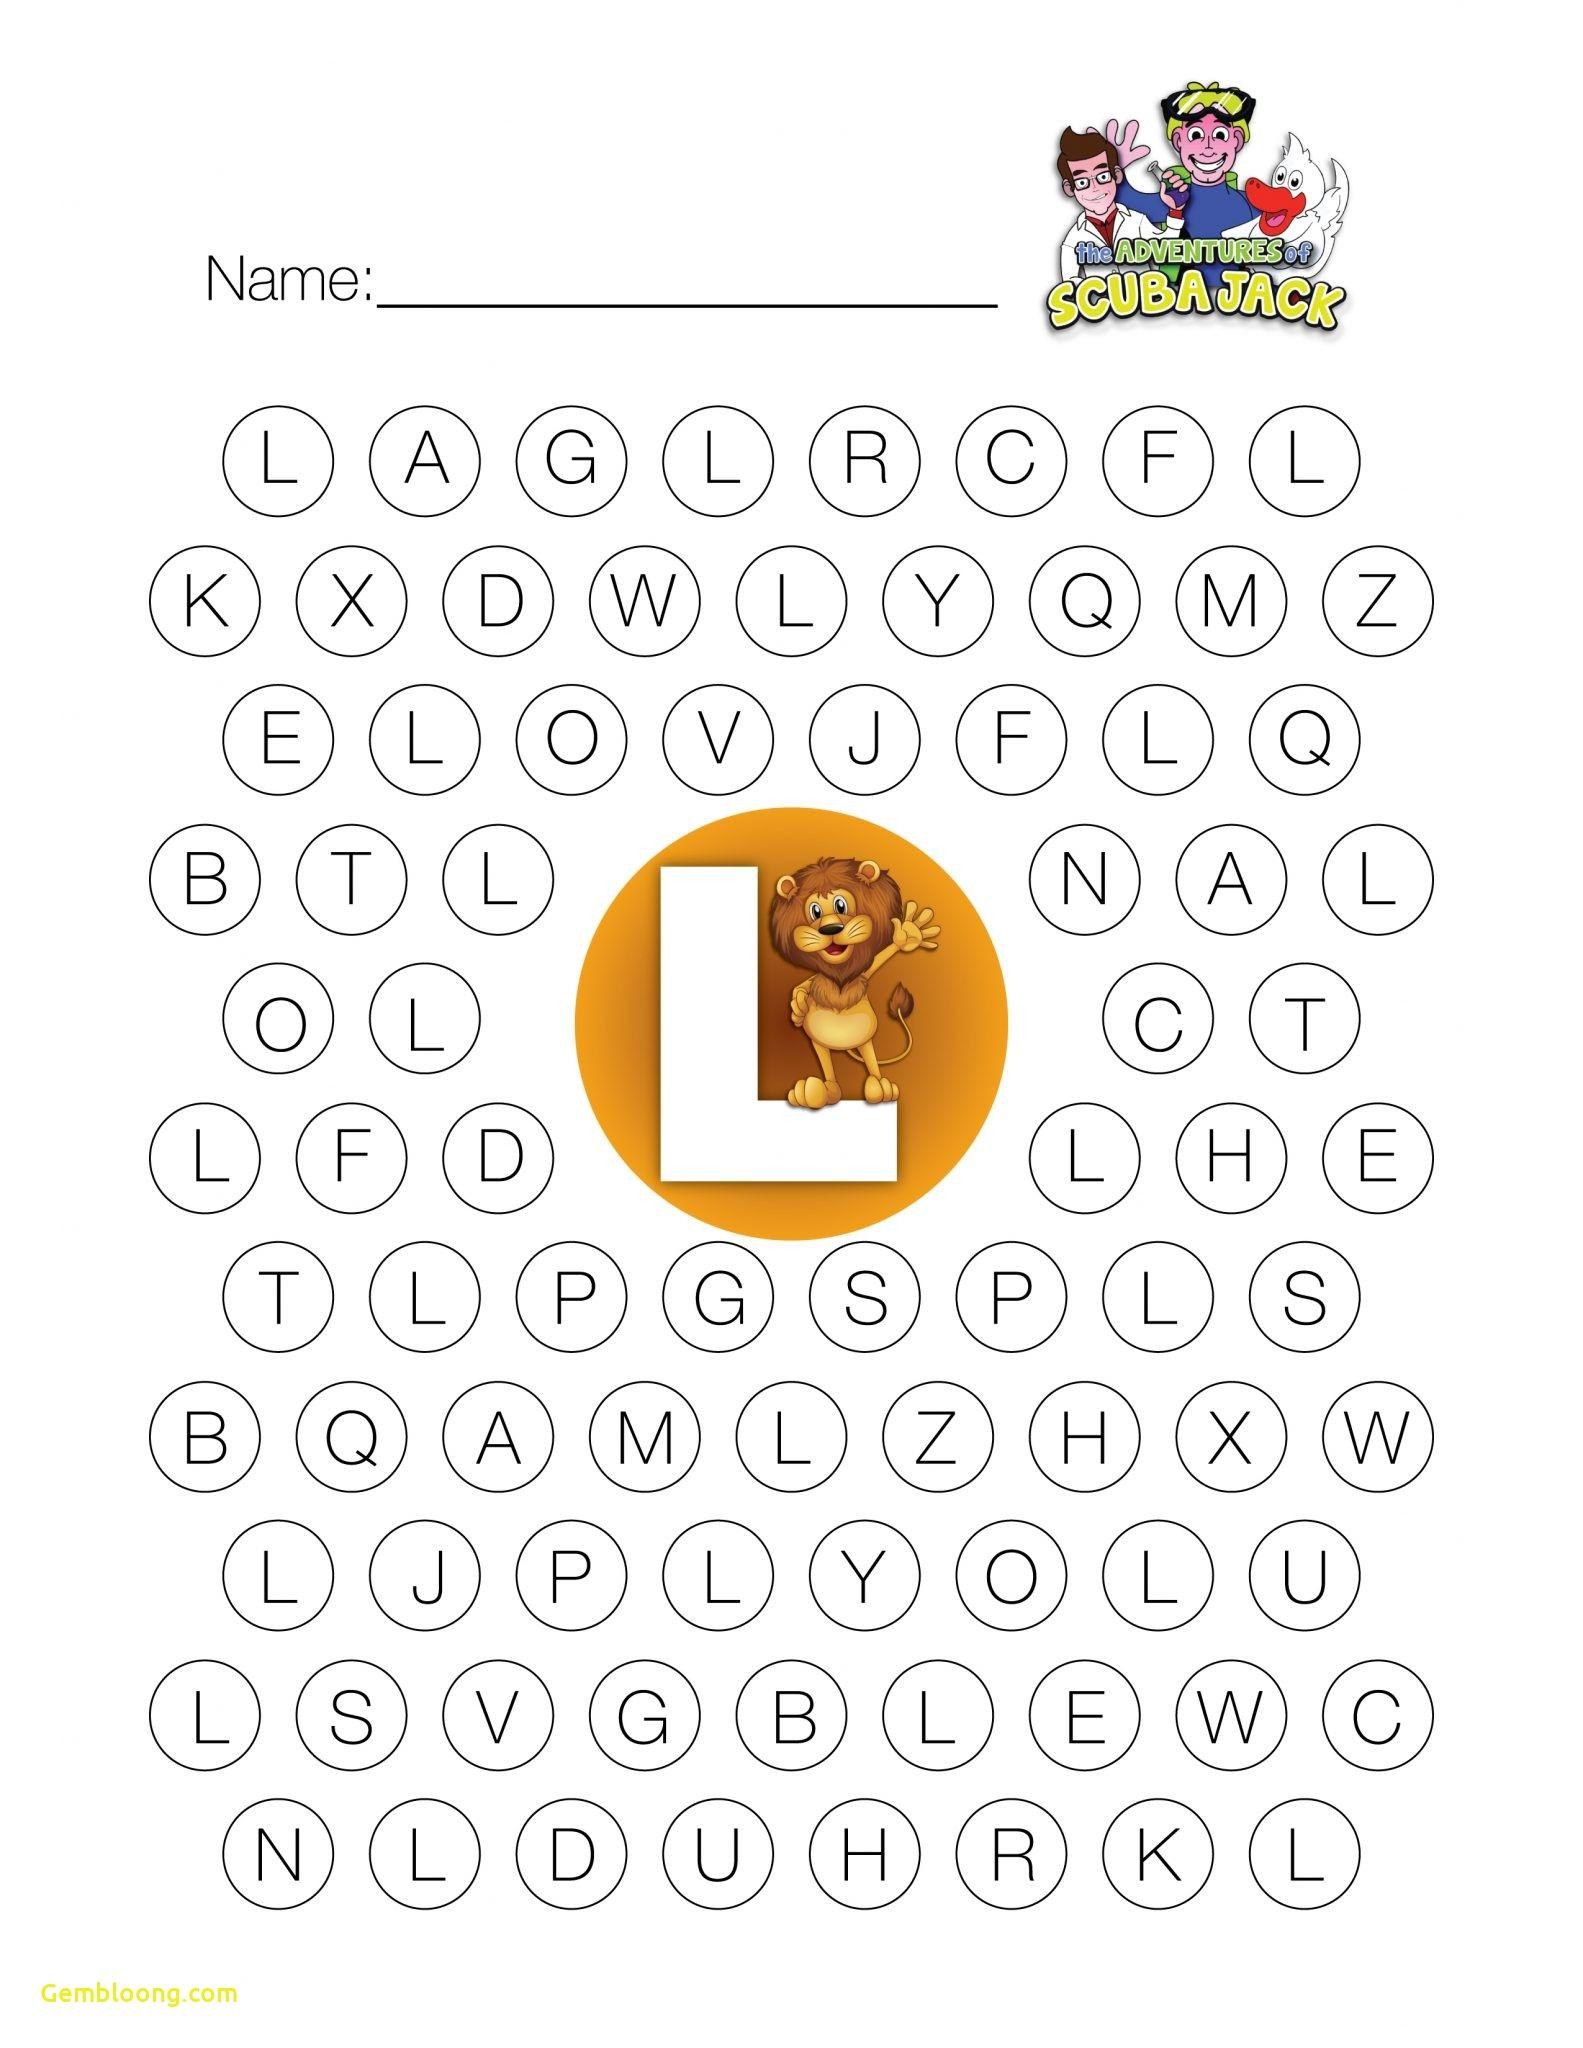 Official Addition Practice Worksheets For Kindergarten Worksheet Printable Printable Preschool Worksheets Shape Worksheets For Preschool Alphabet Worksheets [ 2048 x 1583 Pixel ]